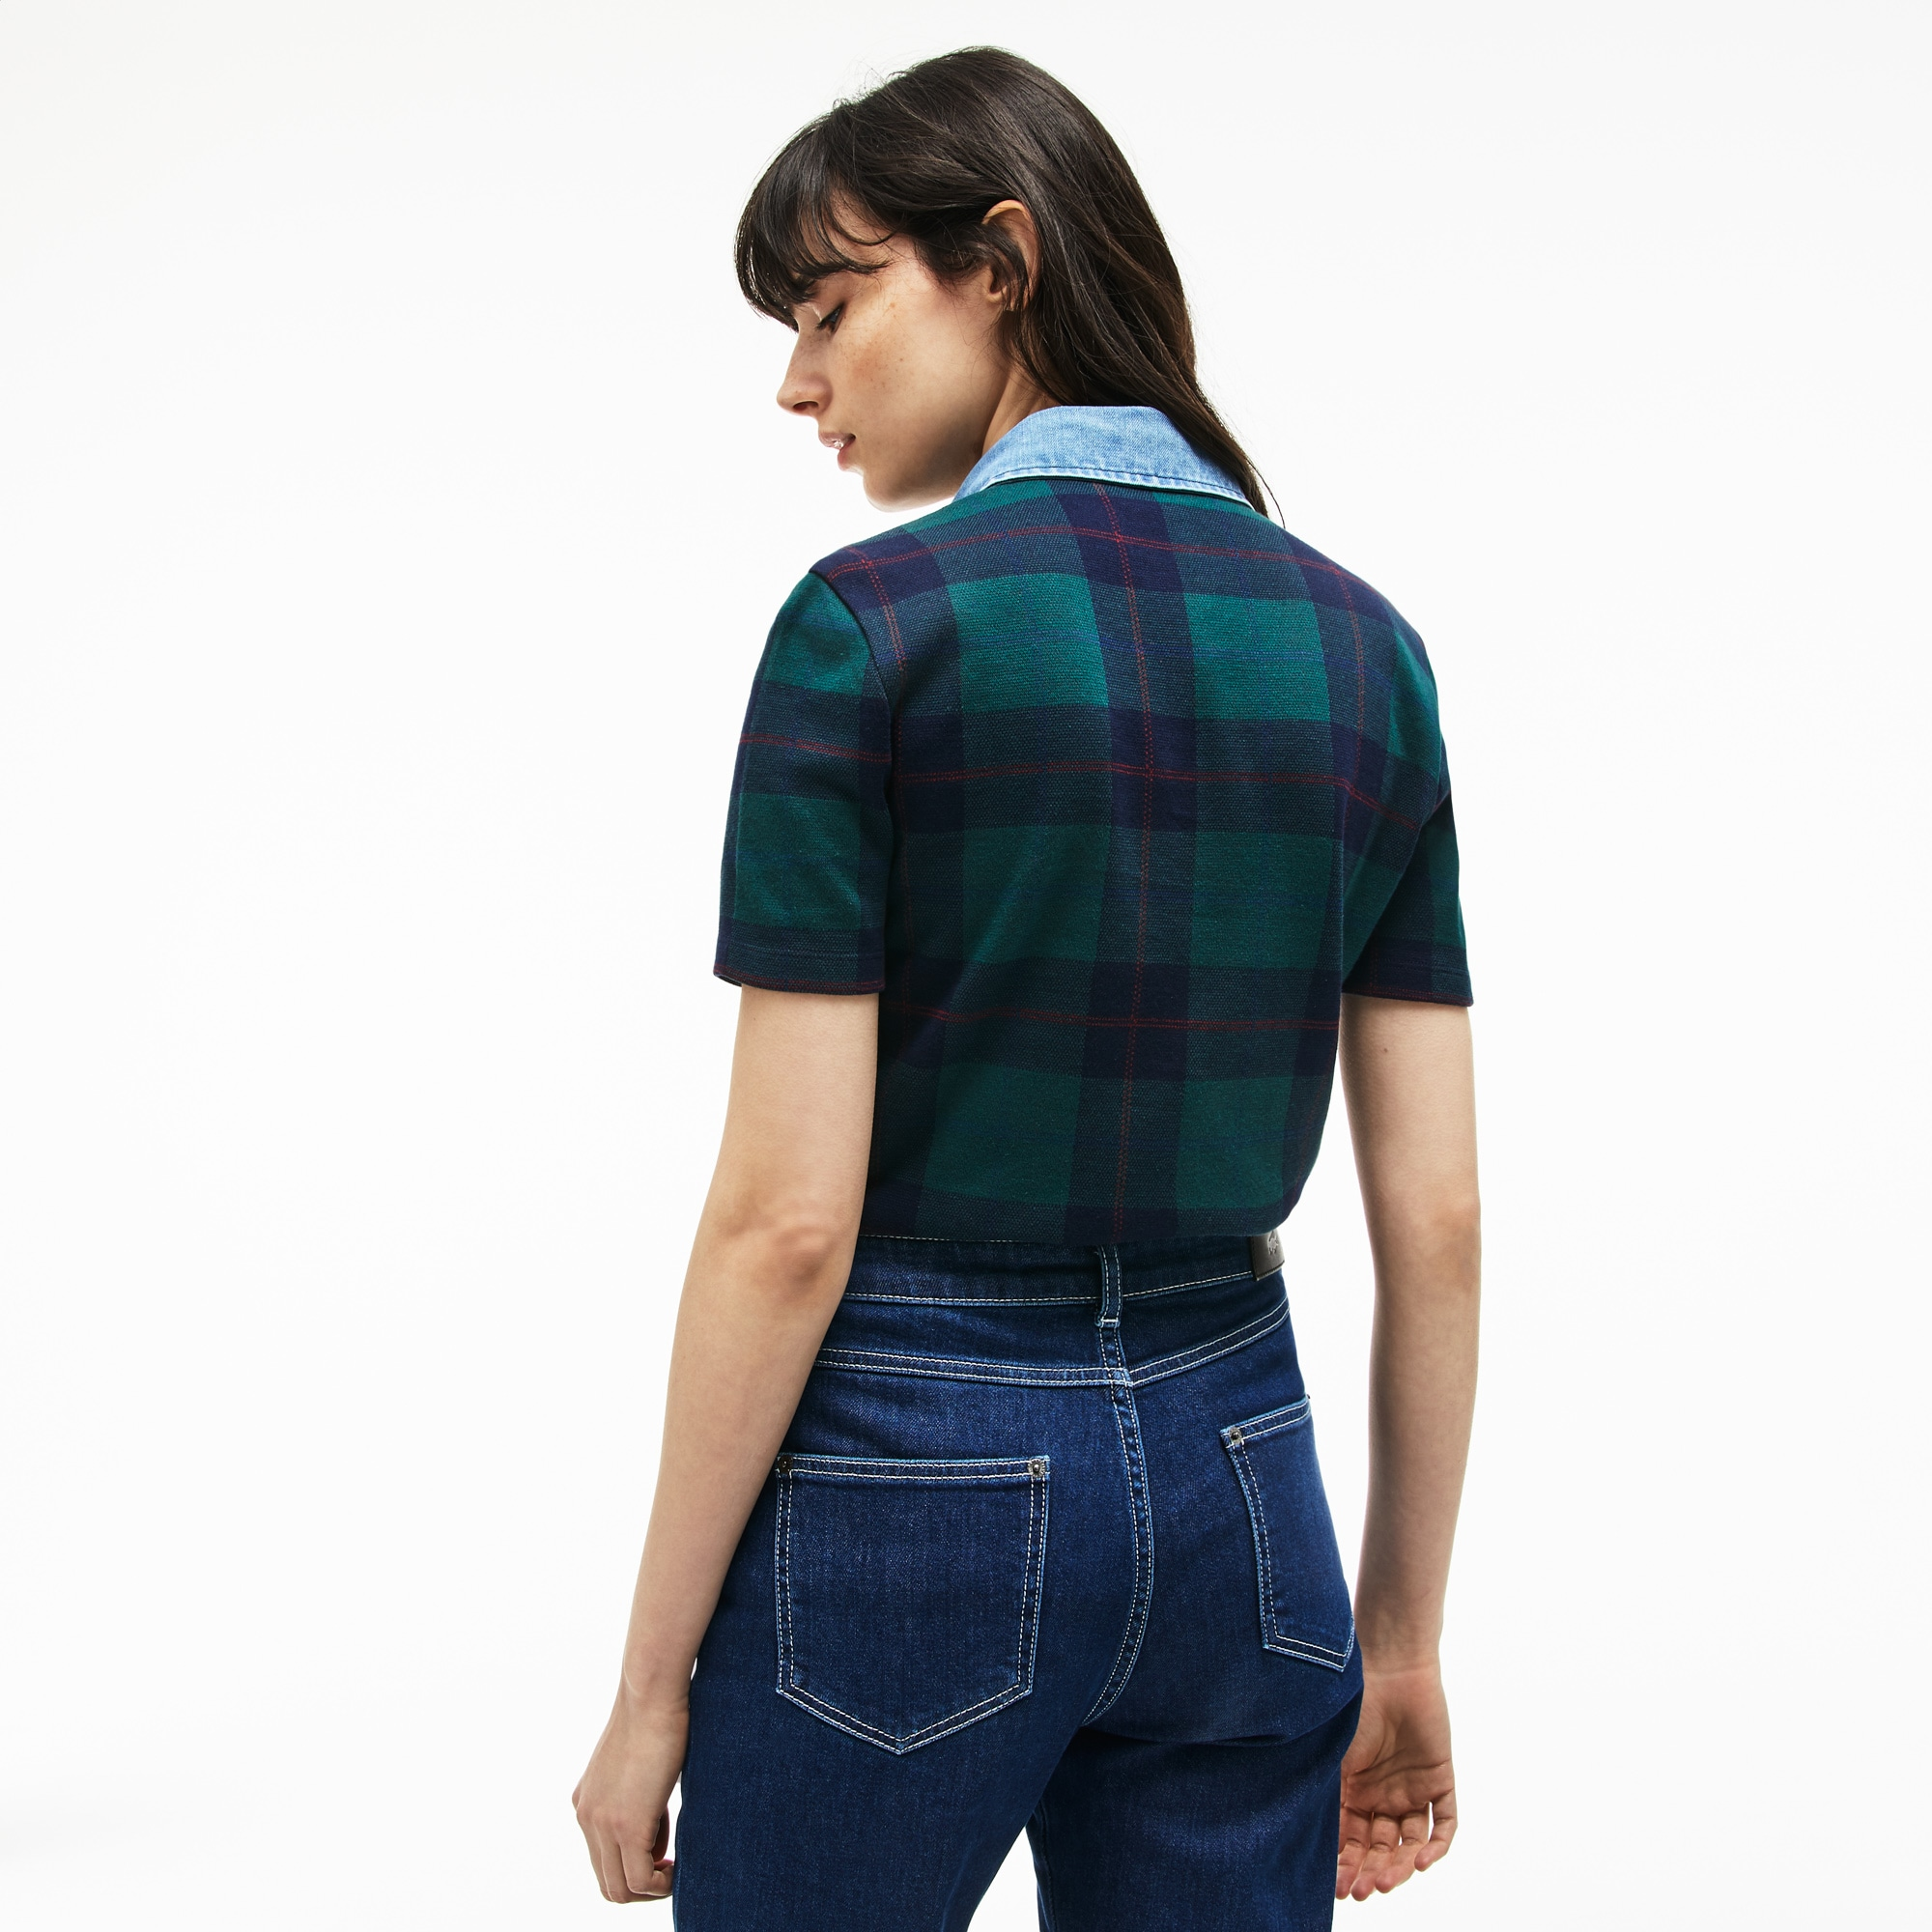 LACOSTE Cottons Women's Tartan Check Cotton Jacquard Polo